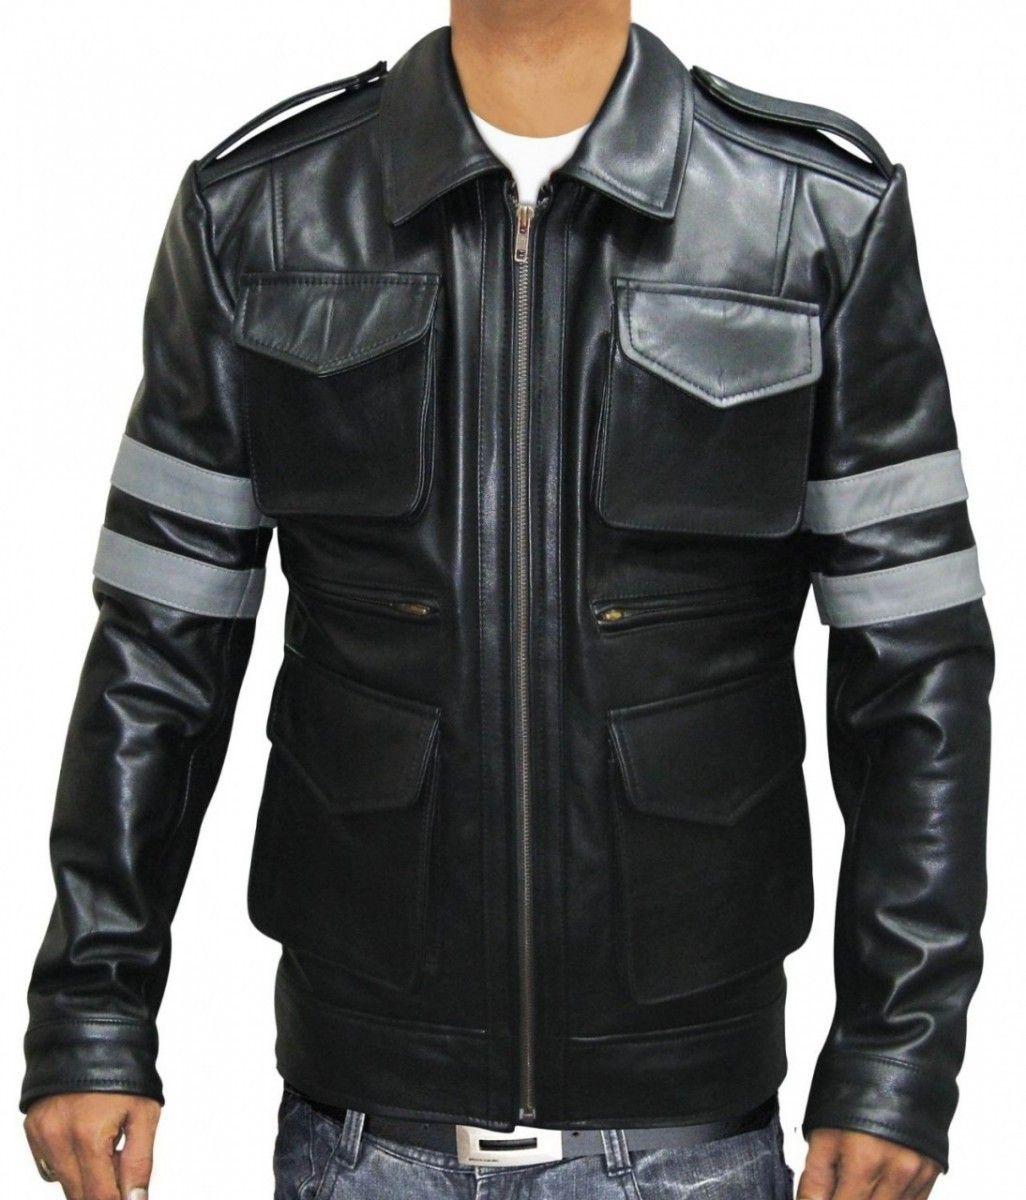 Resident Evil 6 Leon Kennedy Jacket On Bonanza For 189 Celebrities Leather Jacket Resident Evil Jacket Celebrity Jackets [ 1200 x 1026 Pixel ]